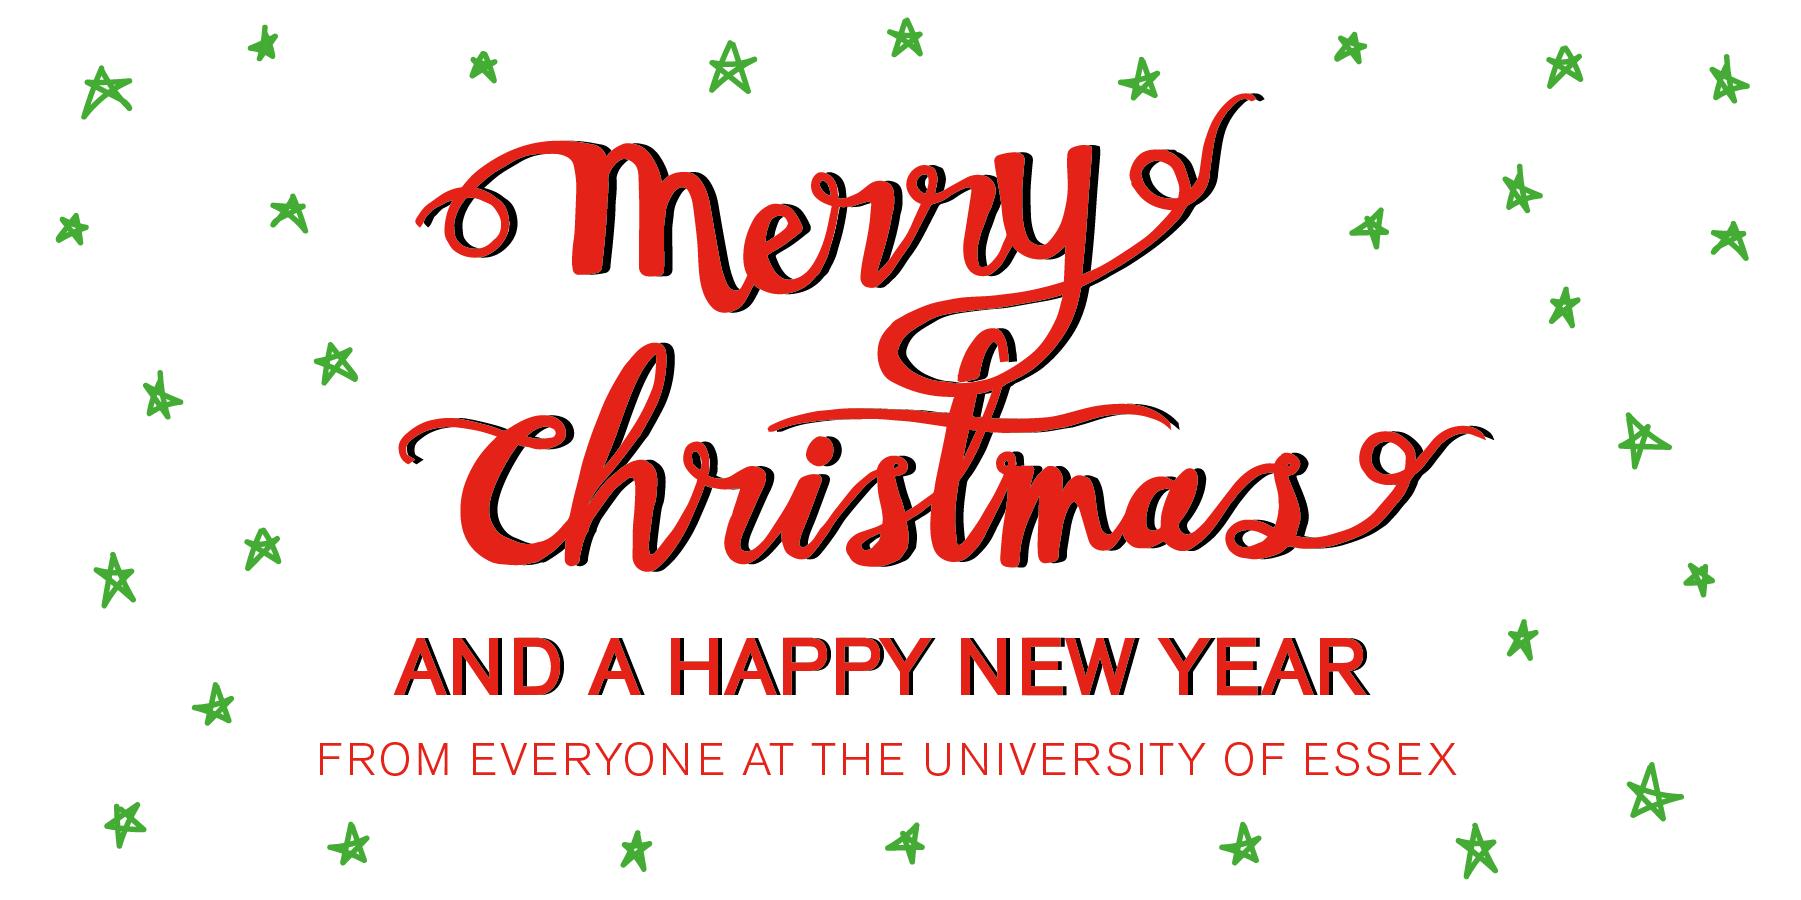 Merry Christmas written in decorative script